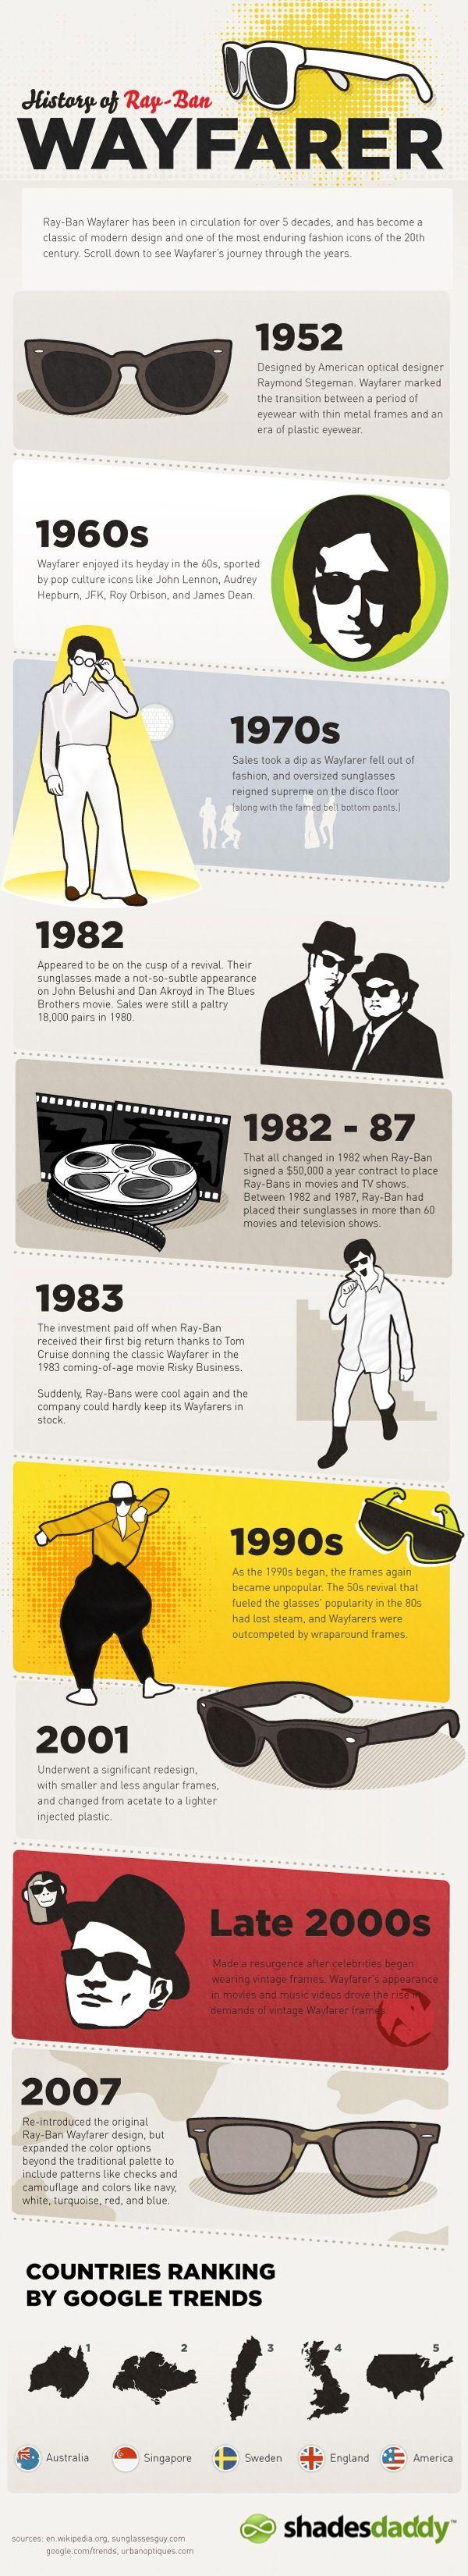 History of Ray-Ban Wayfarers Sunglasses